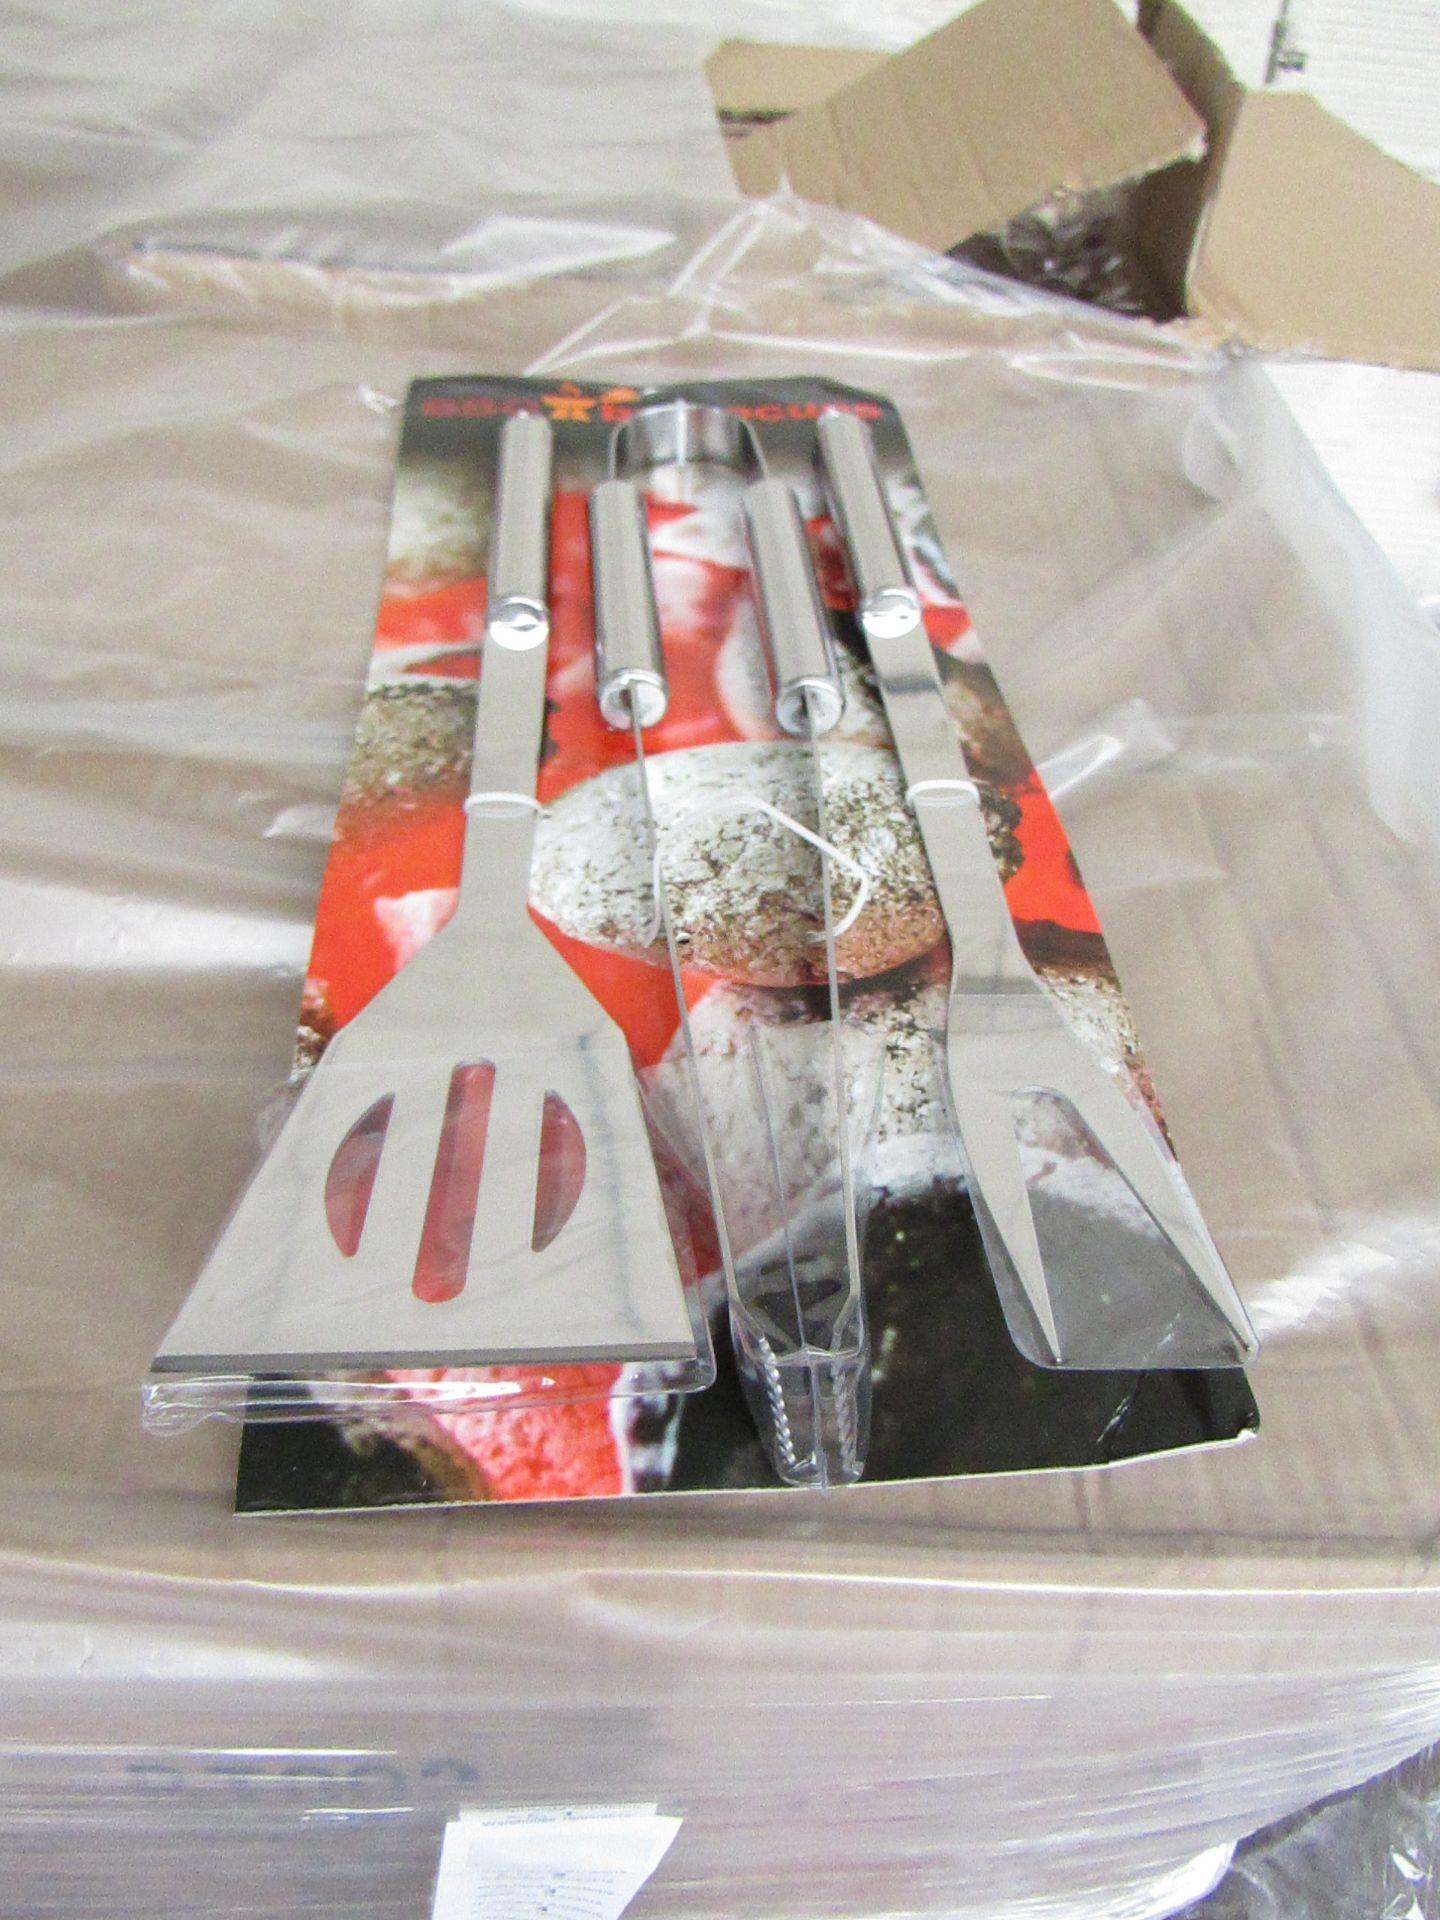 Lot 8 - 5x 3 piece BBQ tool kits, new still attached to POS